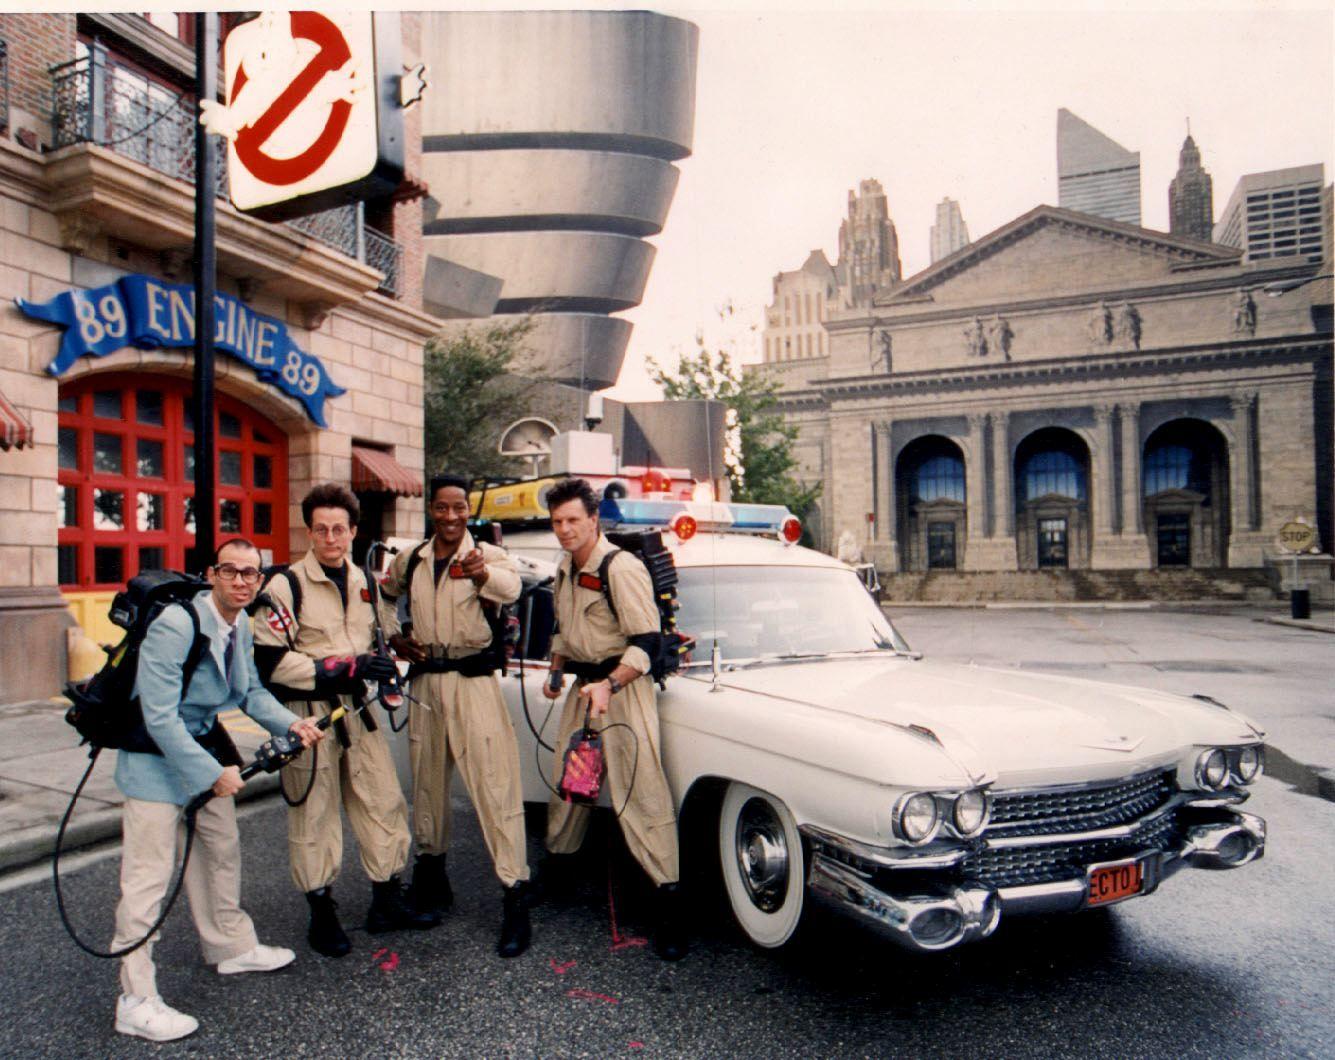 Old School Universal Studios Florida Page 4 Universal Studios Rides Universal Studios Florida Orlando Theme Parks